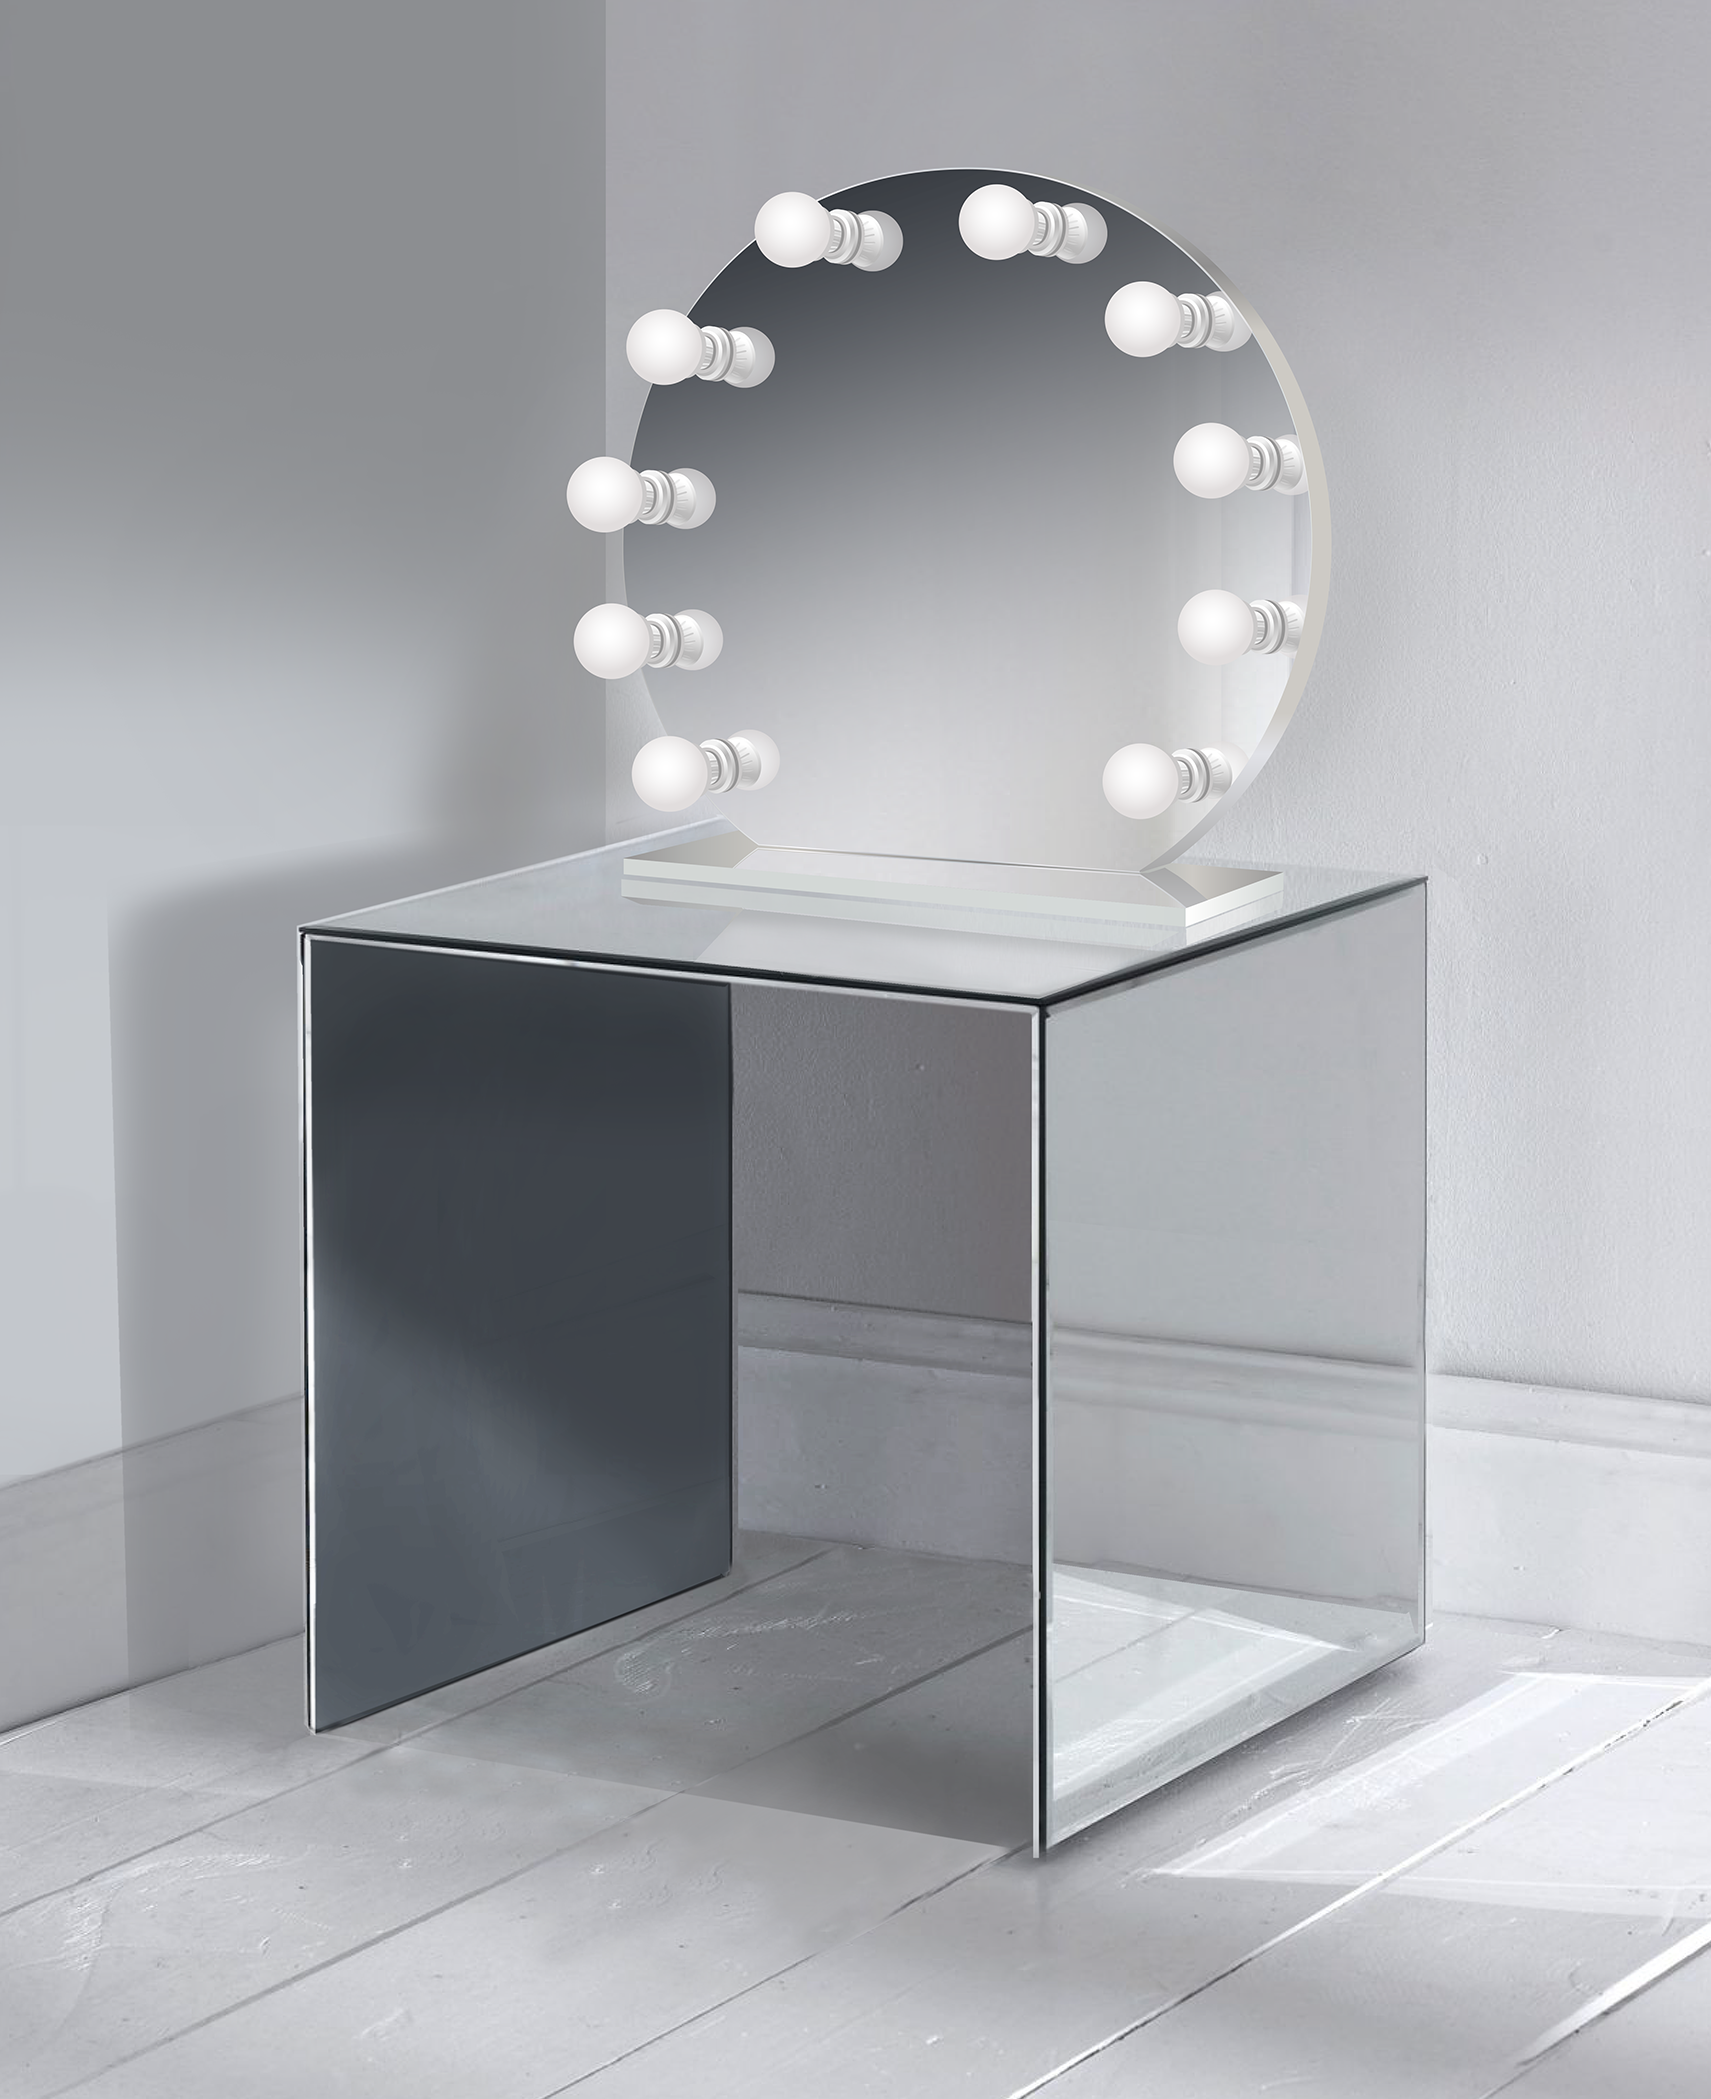 Iris 28 Glam mirror, Installing Makeup table